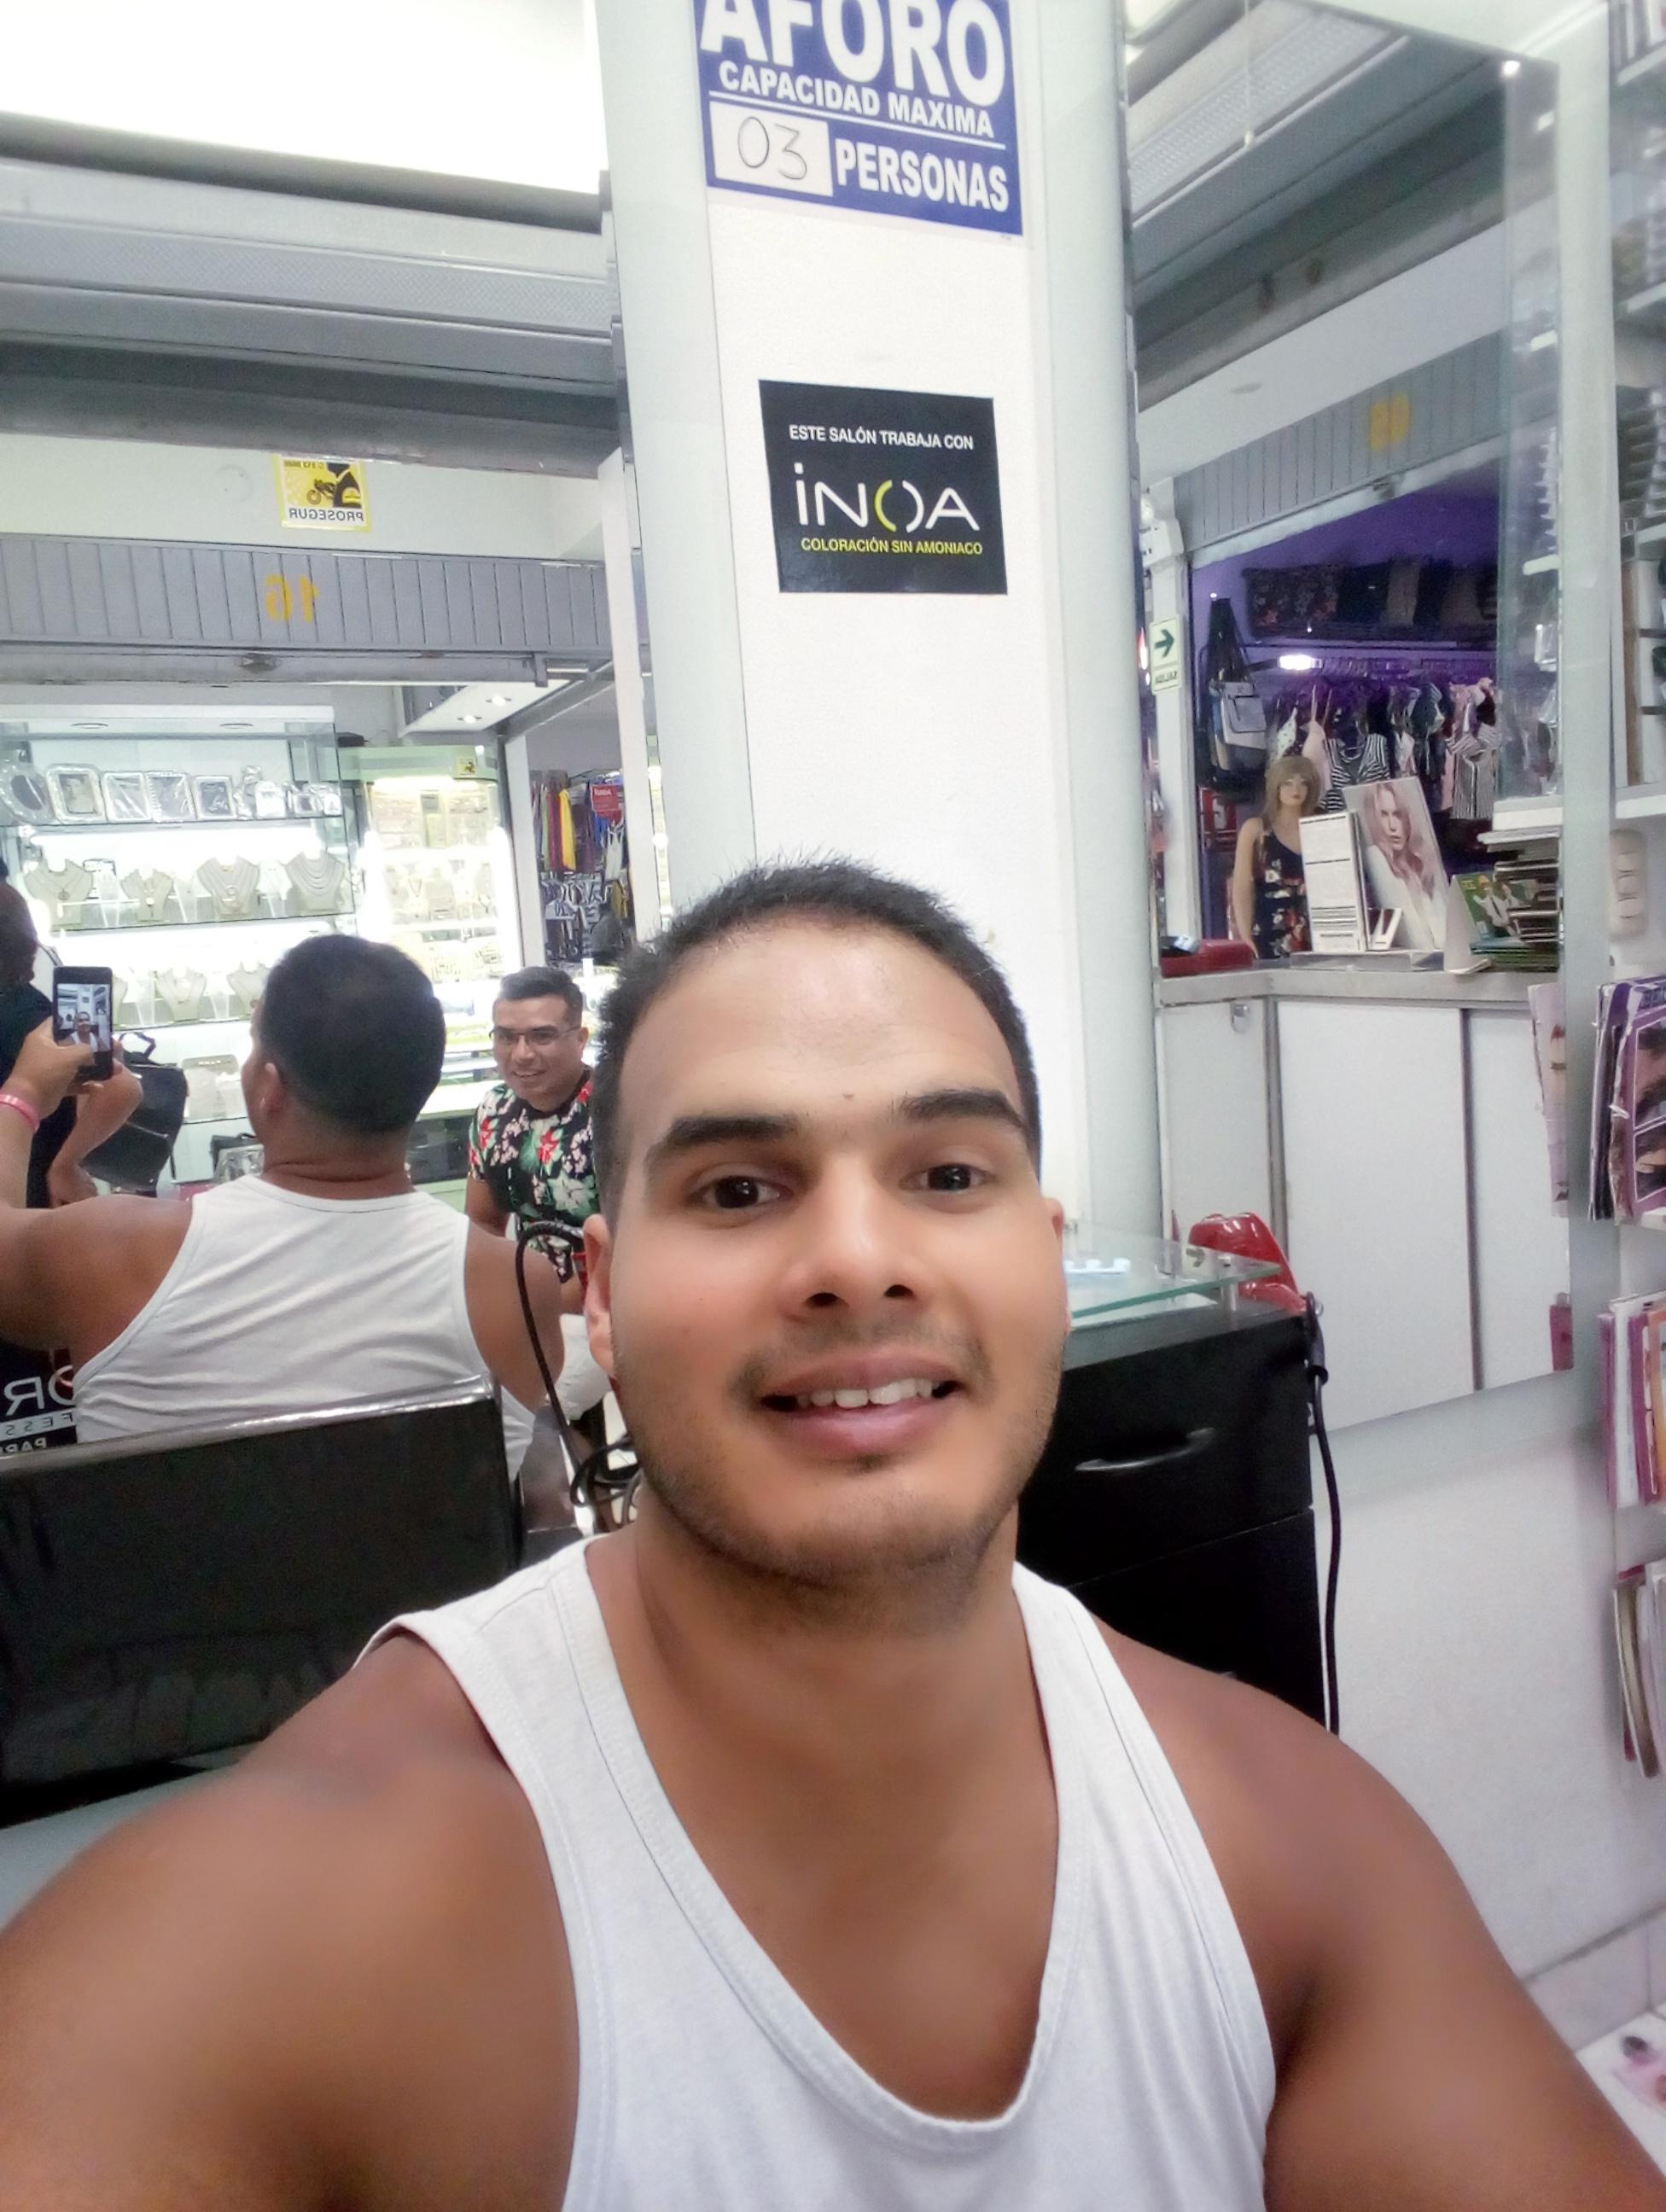 Renzo Patricio  Marres Egoavil